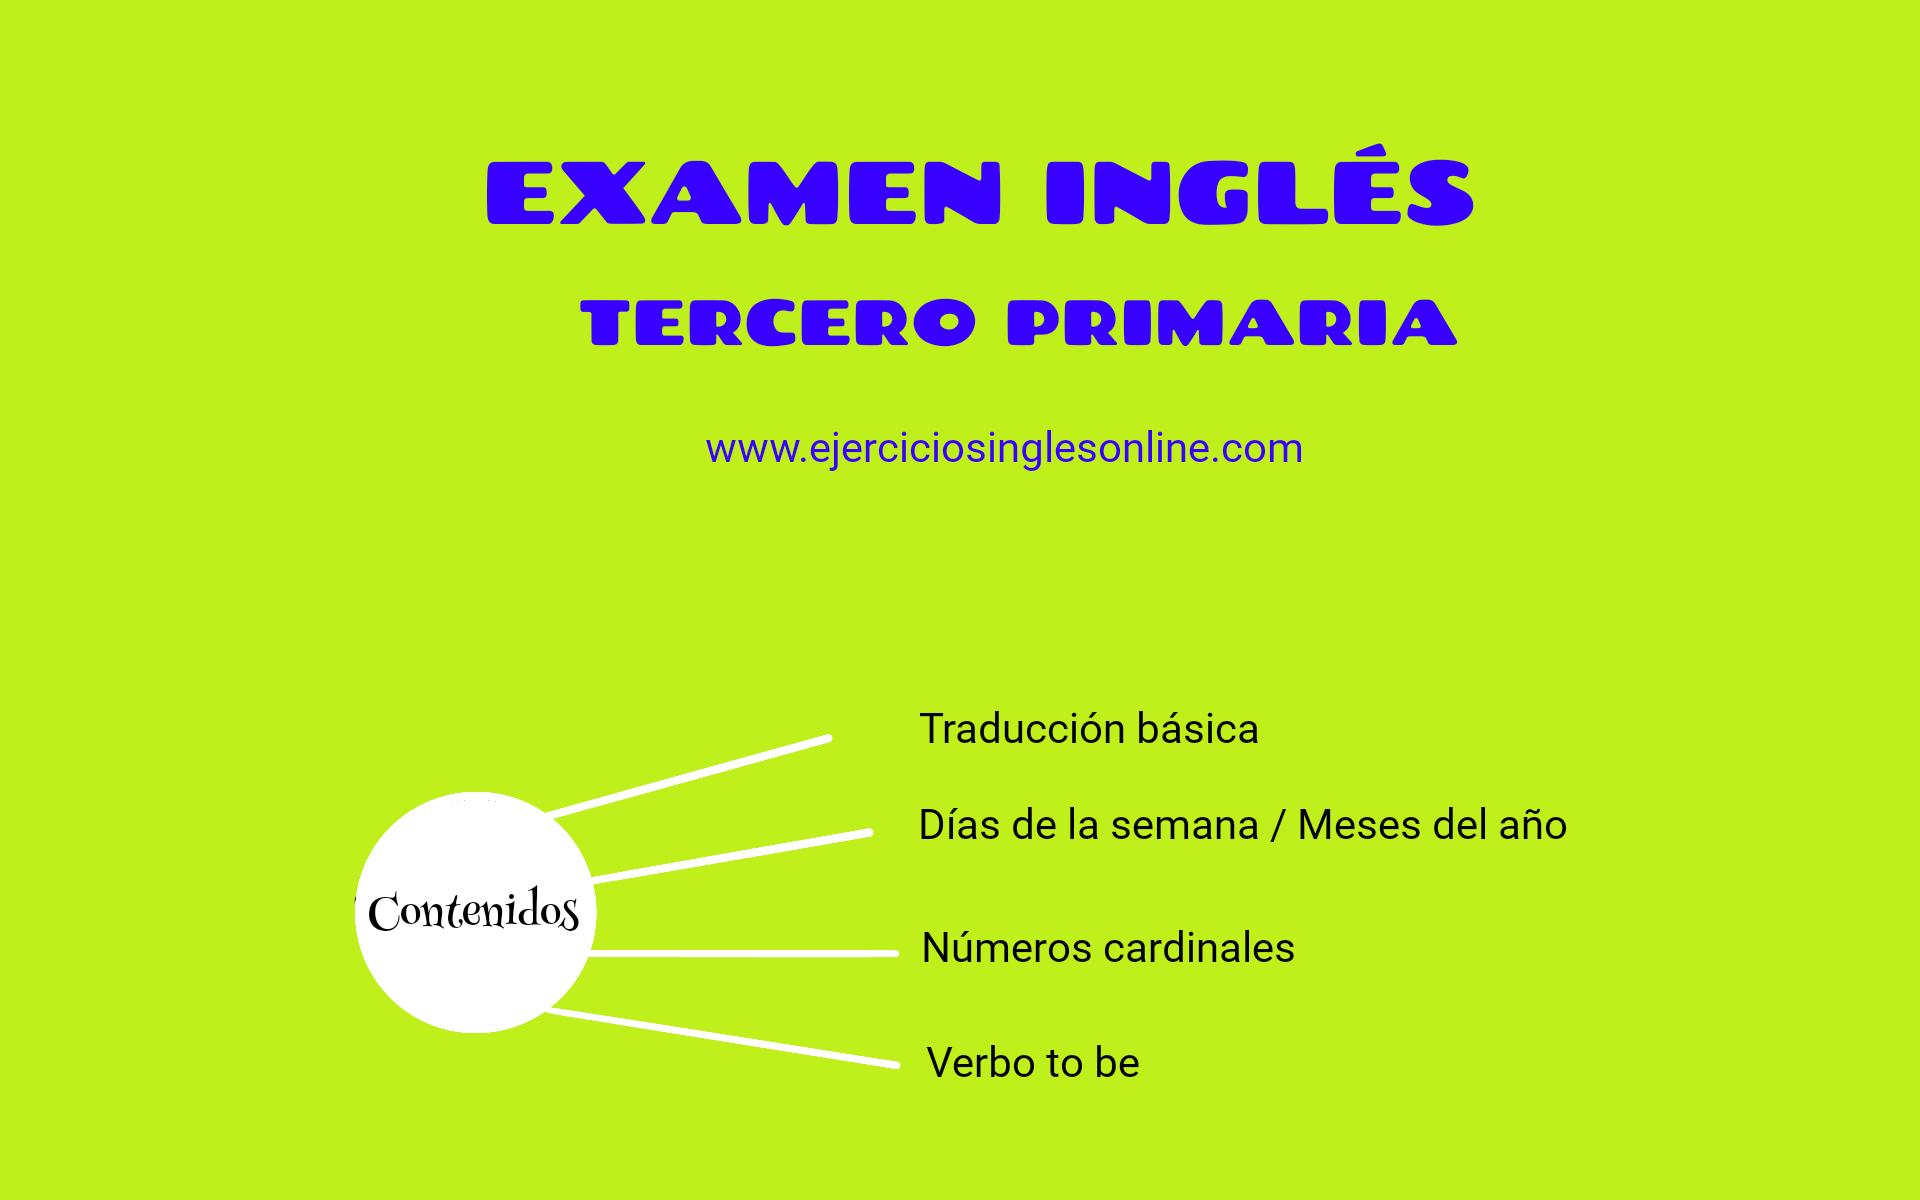 Examen Ingles 3º Primaria Ejercicios Ingles Online